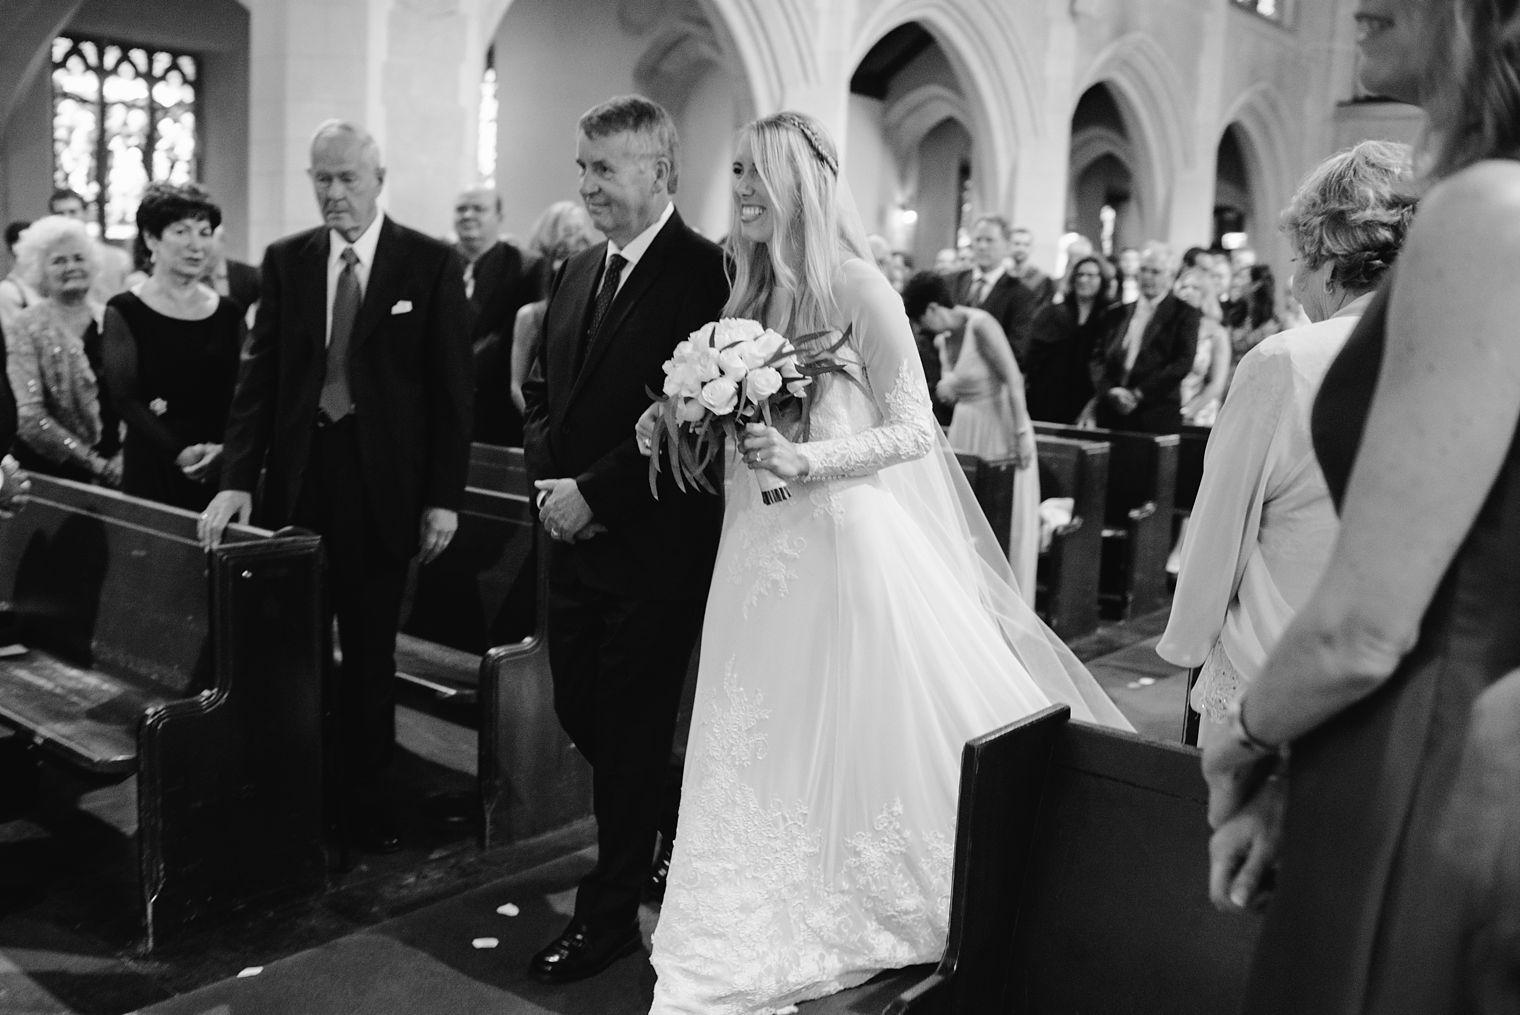 wesley united church wedding vancouver